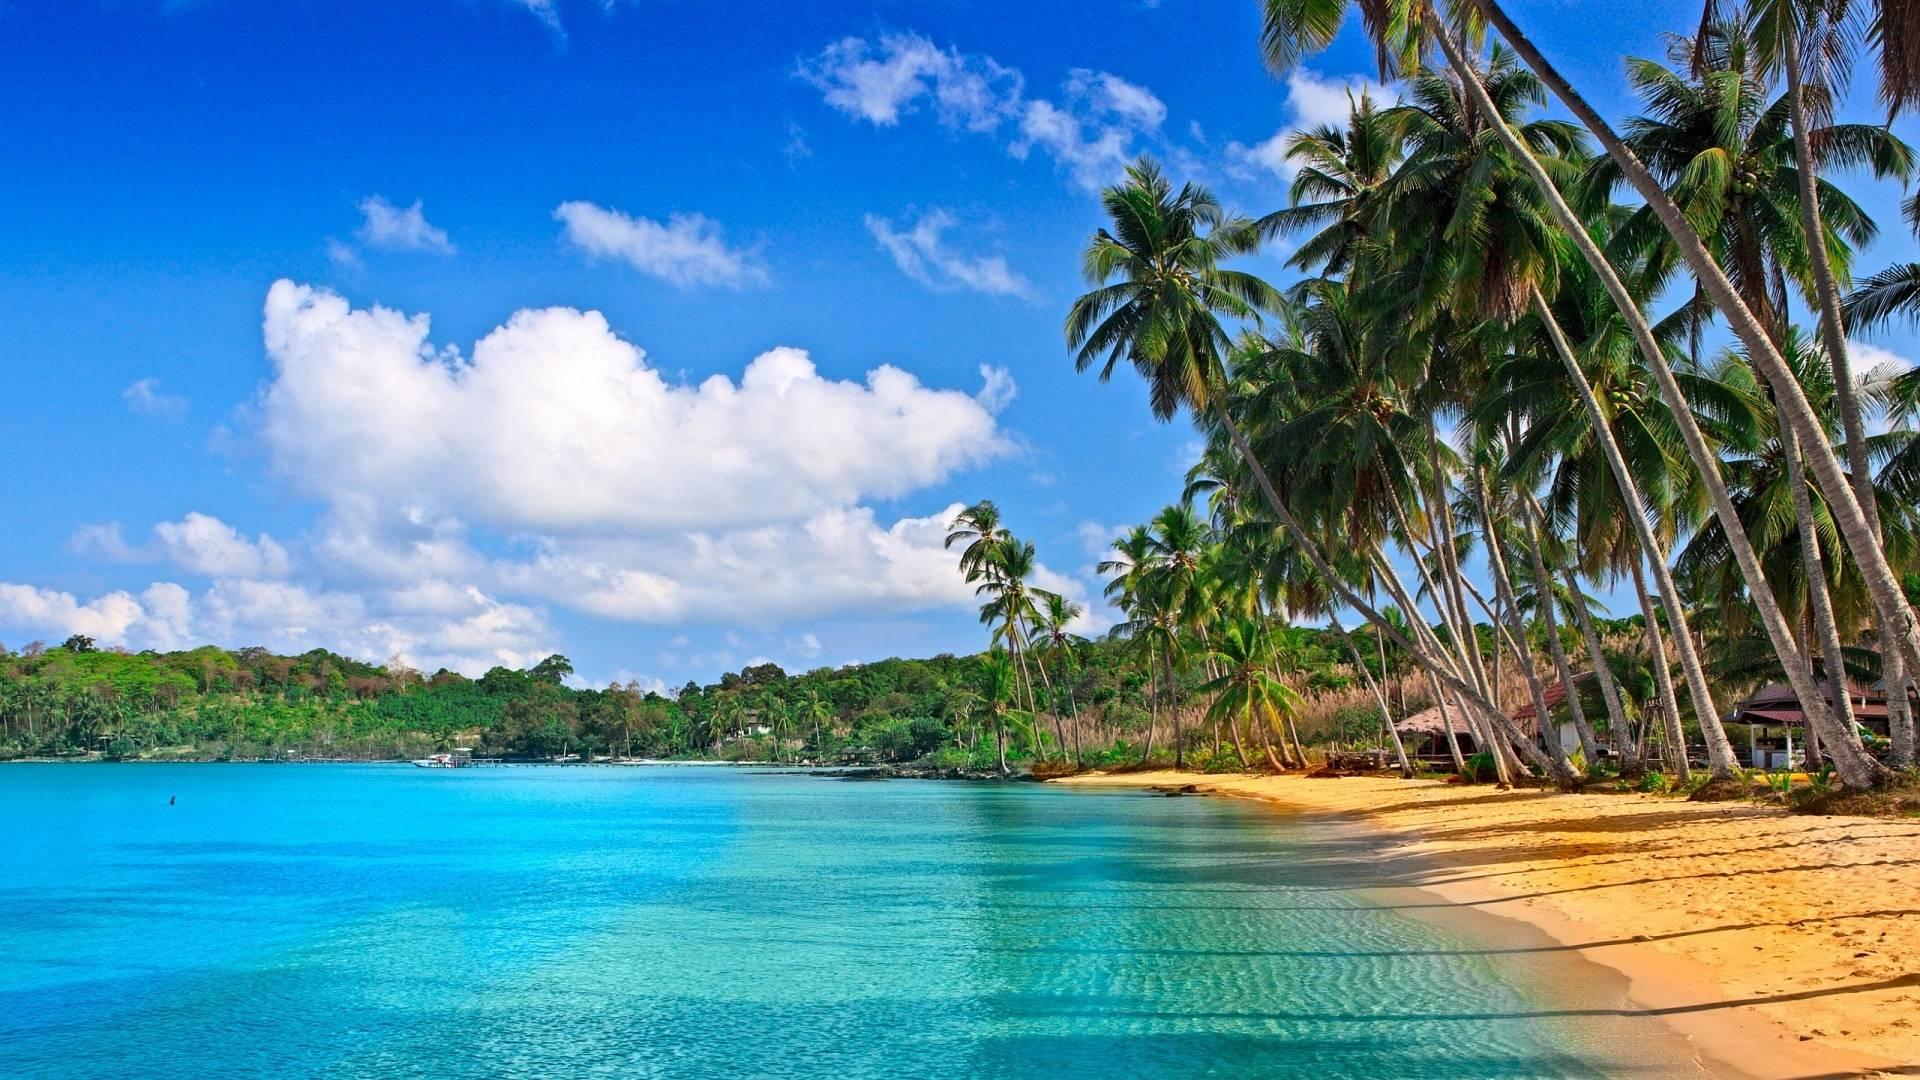 163028 Barbados Caribbean Wallpaper Hd image backgrounds